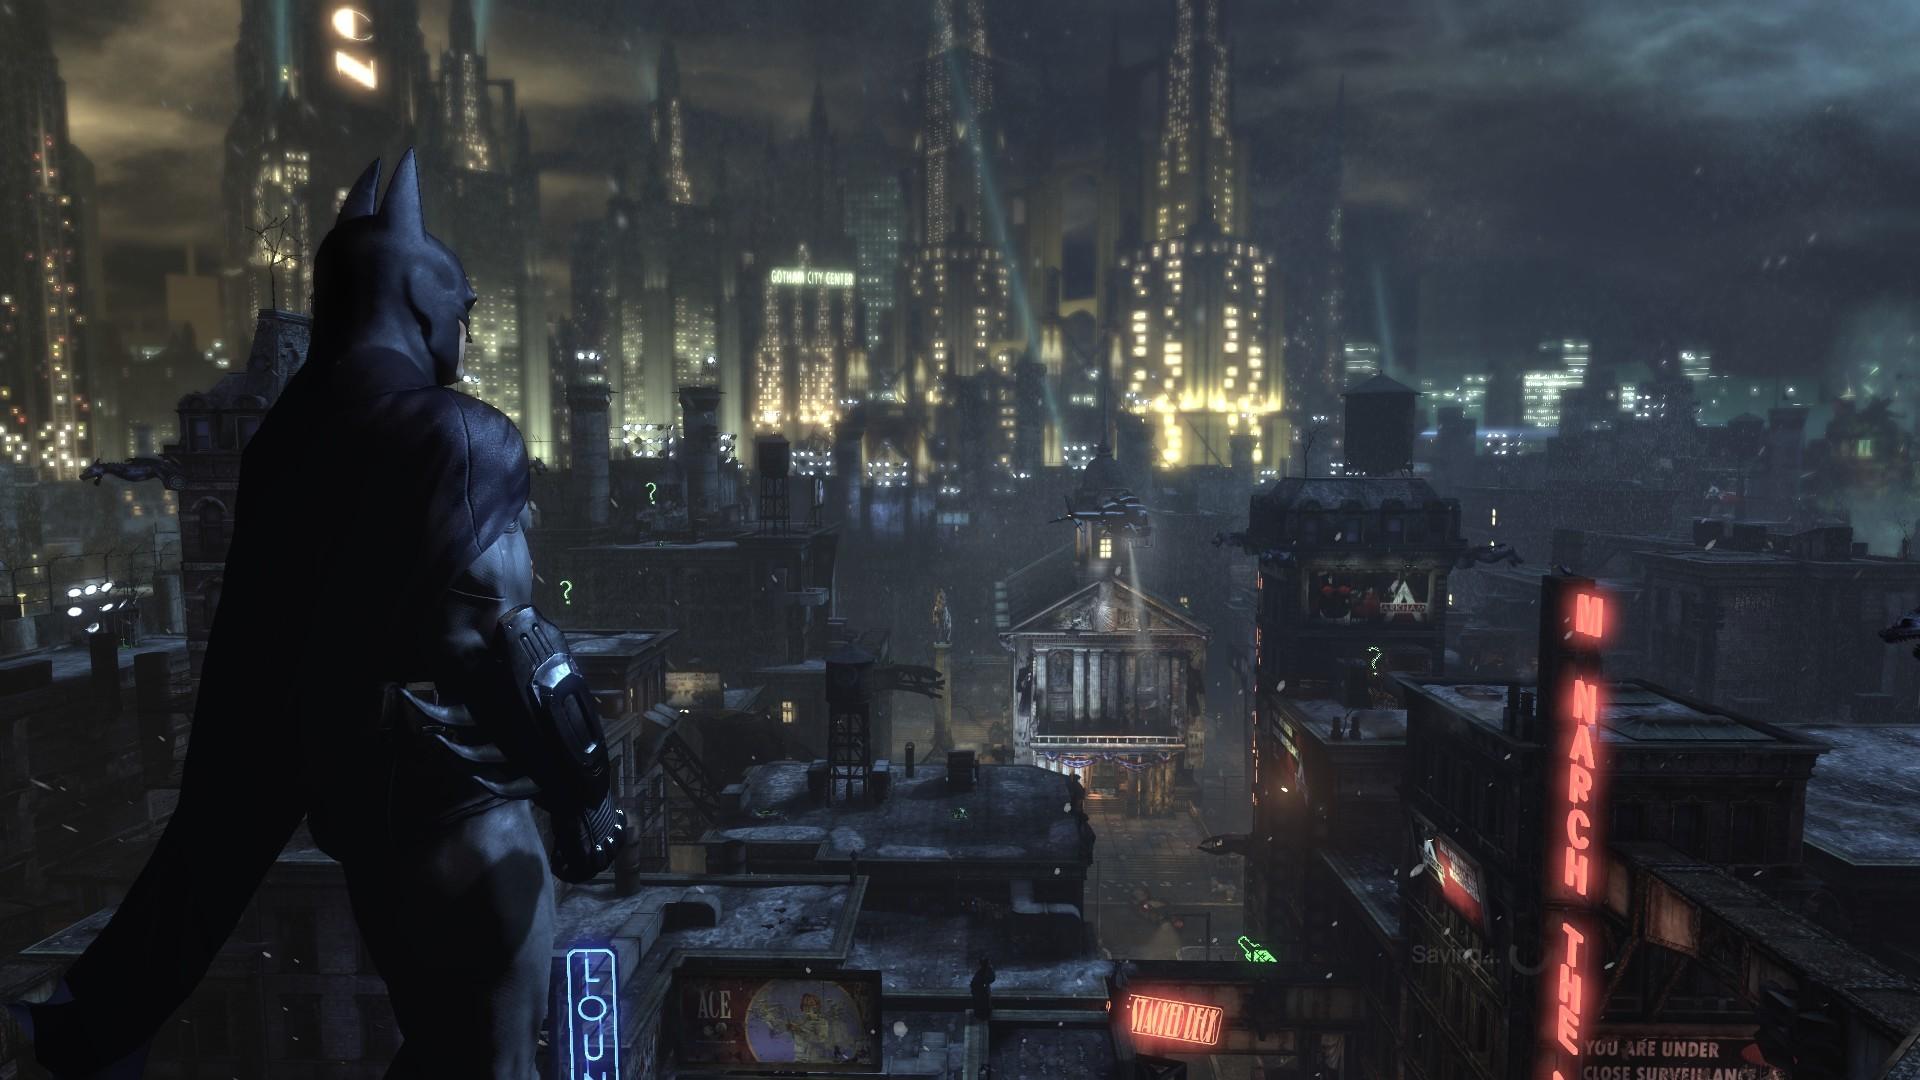 Download Batman Gotham City Background Images Wallpaper #73476